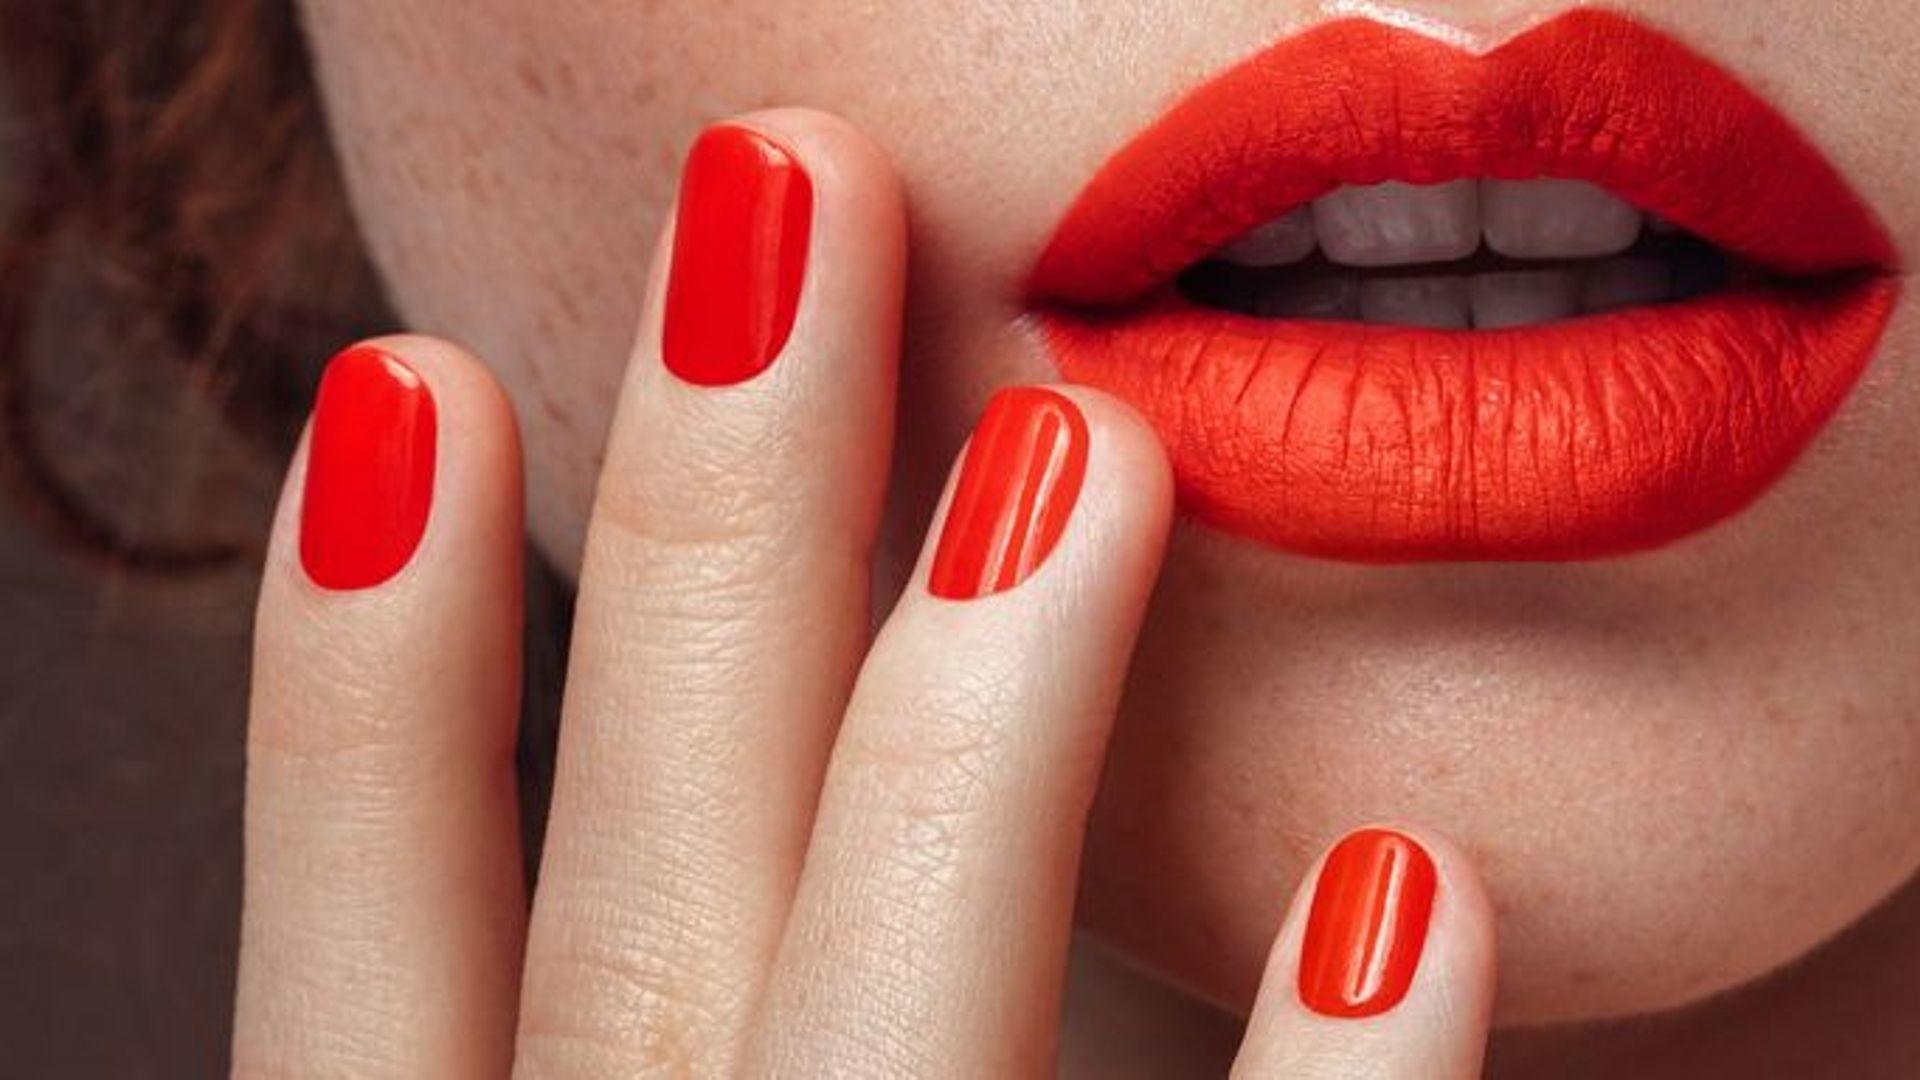 Shellac Nails Versus Gel Manicures, Explained